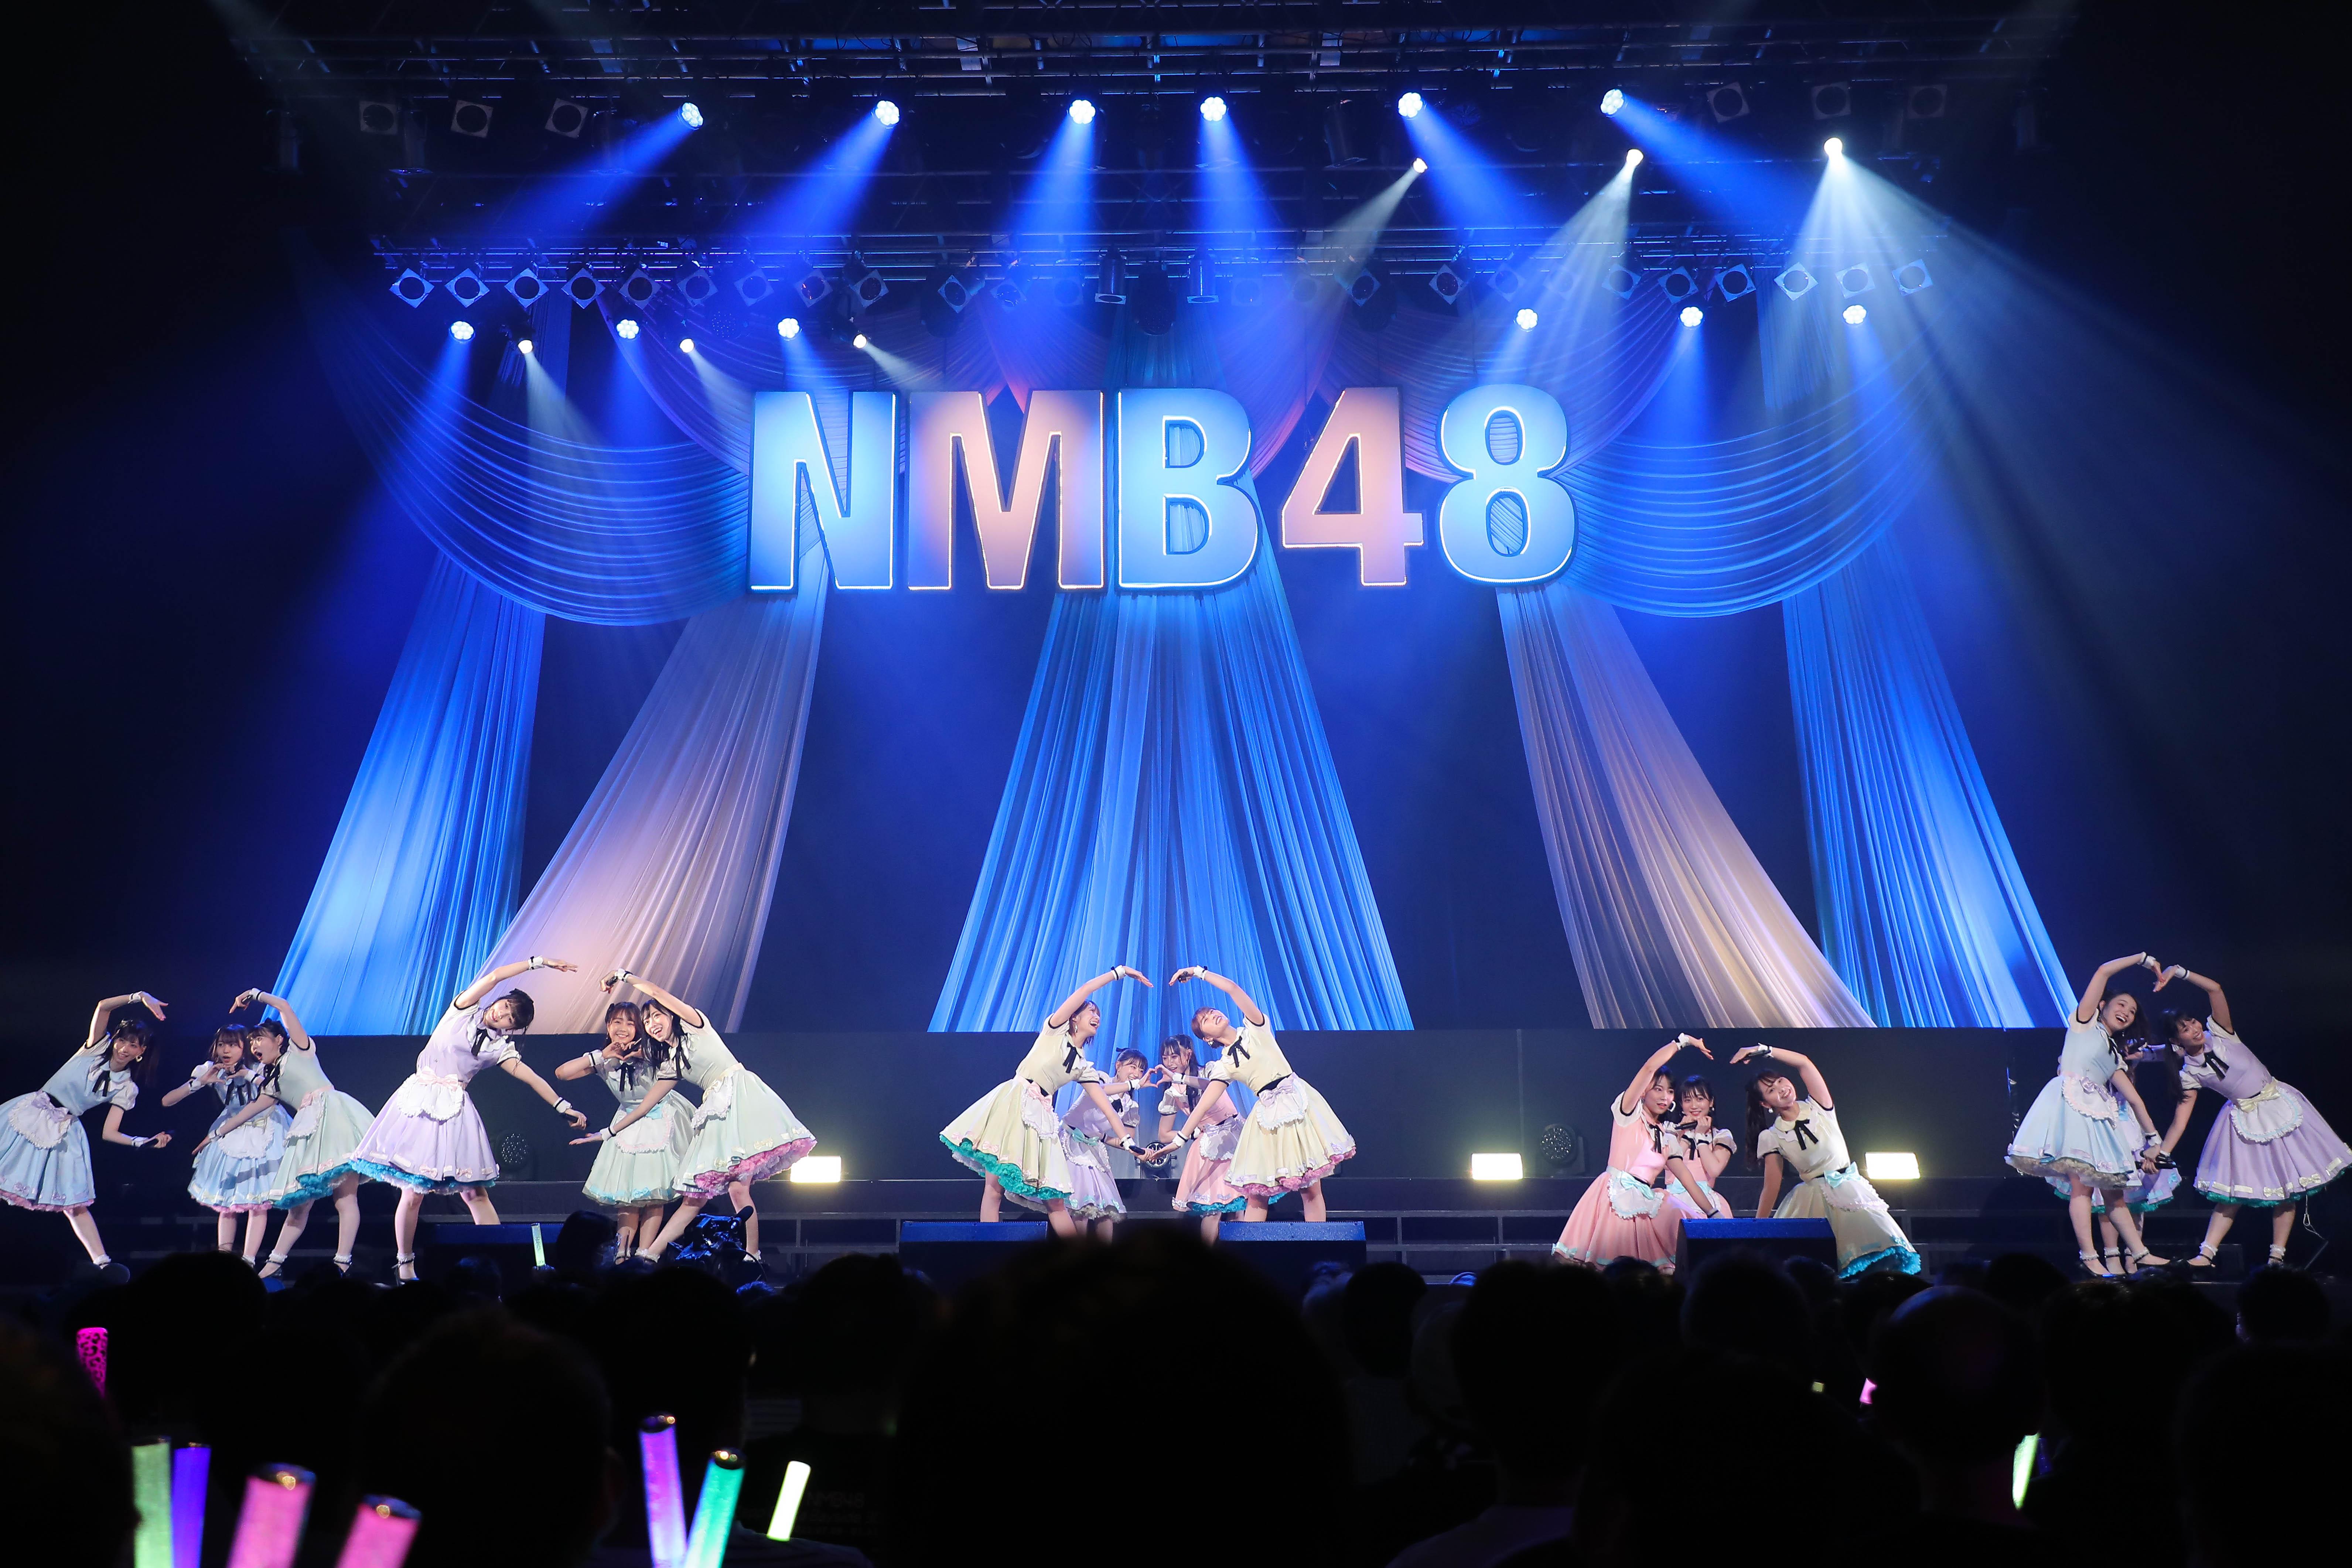 (C) NMB48